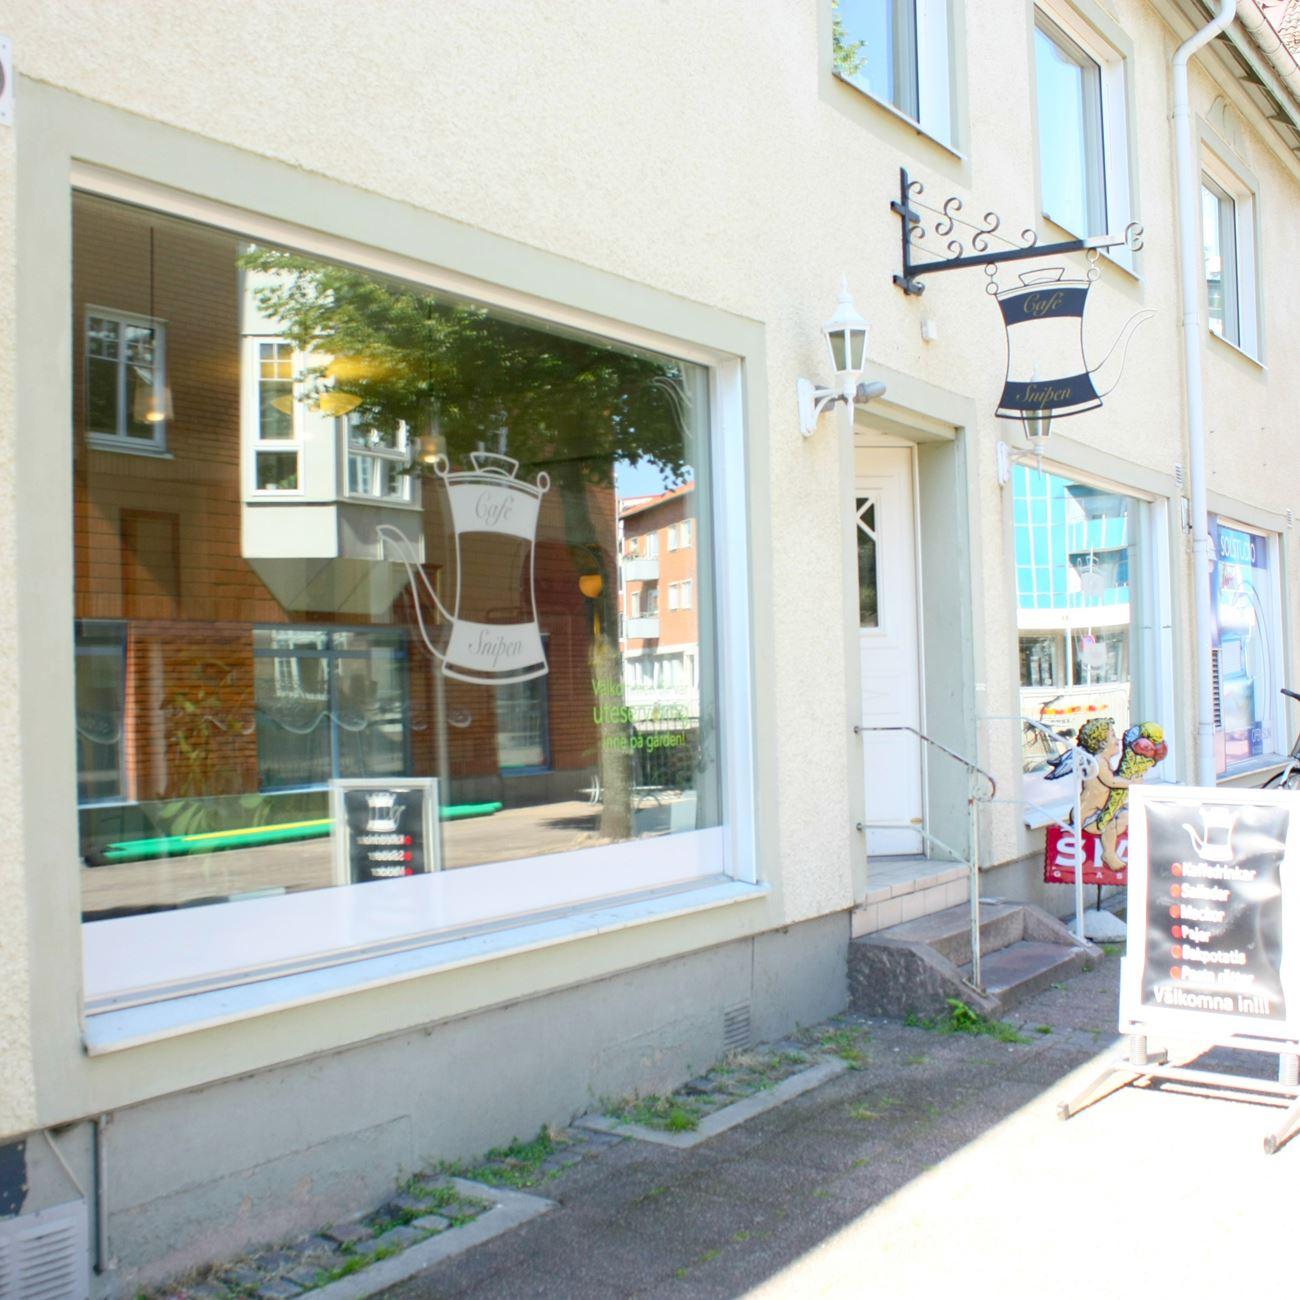 Café Snipen